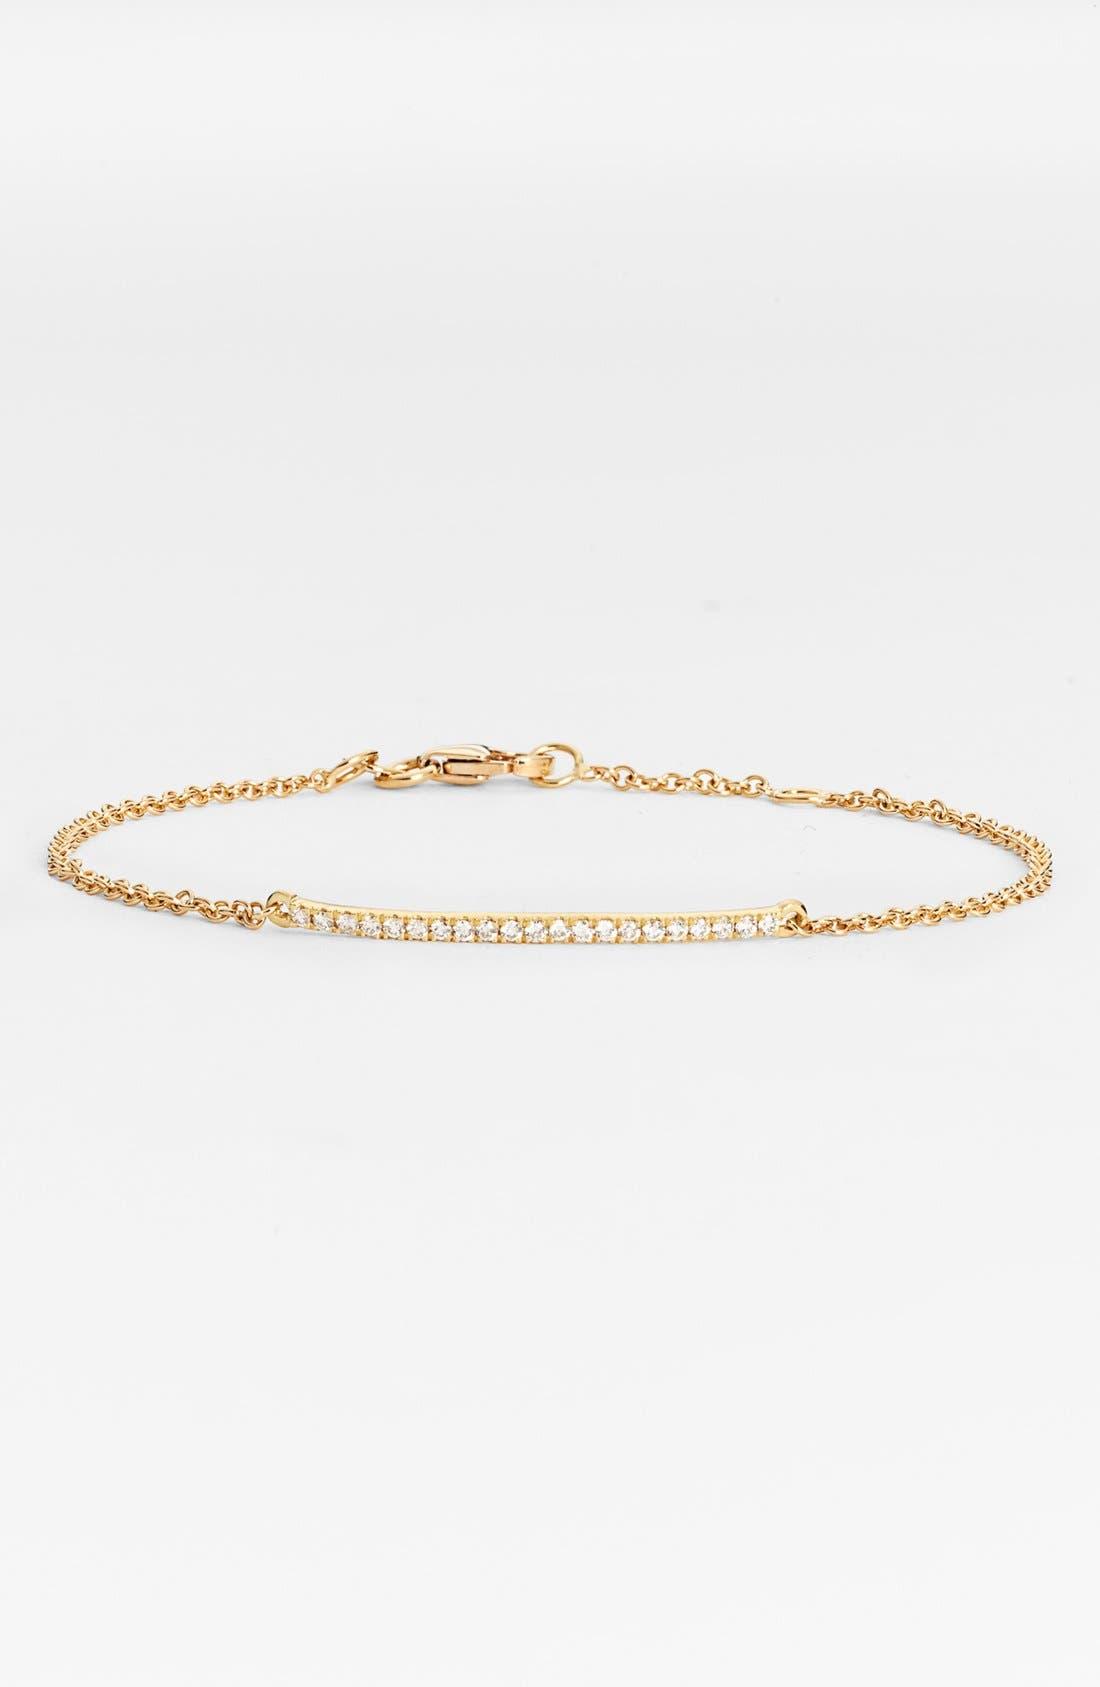 Alternate Image 1 Selected - Bony Levy Diamond Bar Bracelet (Nordstrom Exclusive)